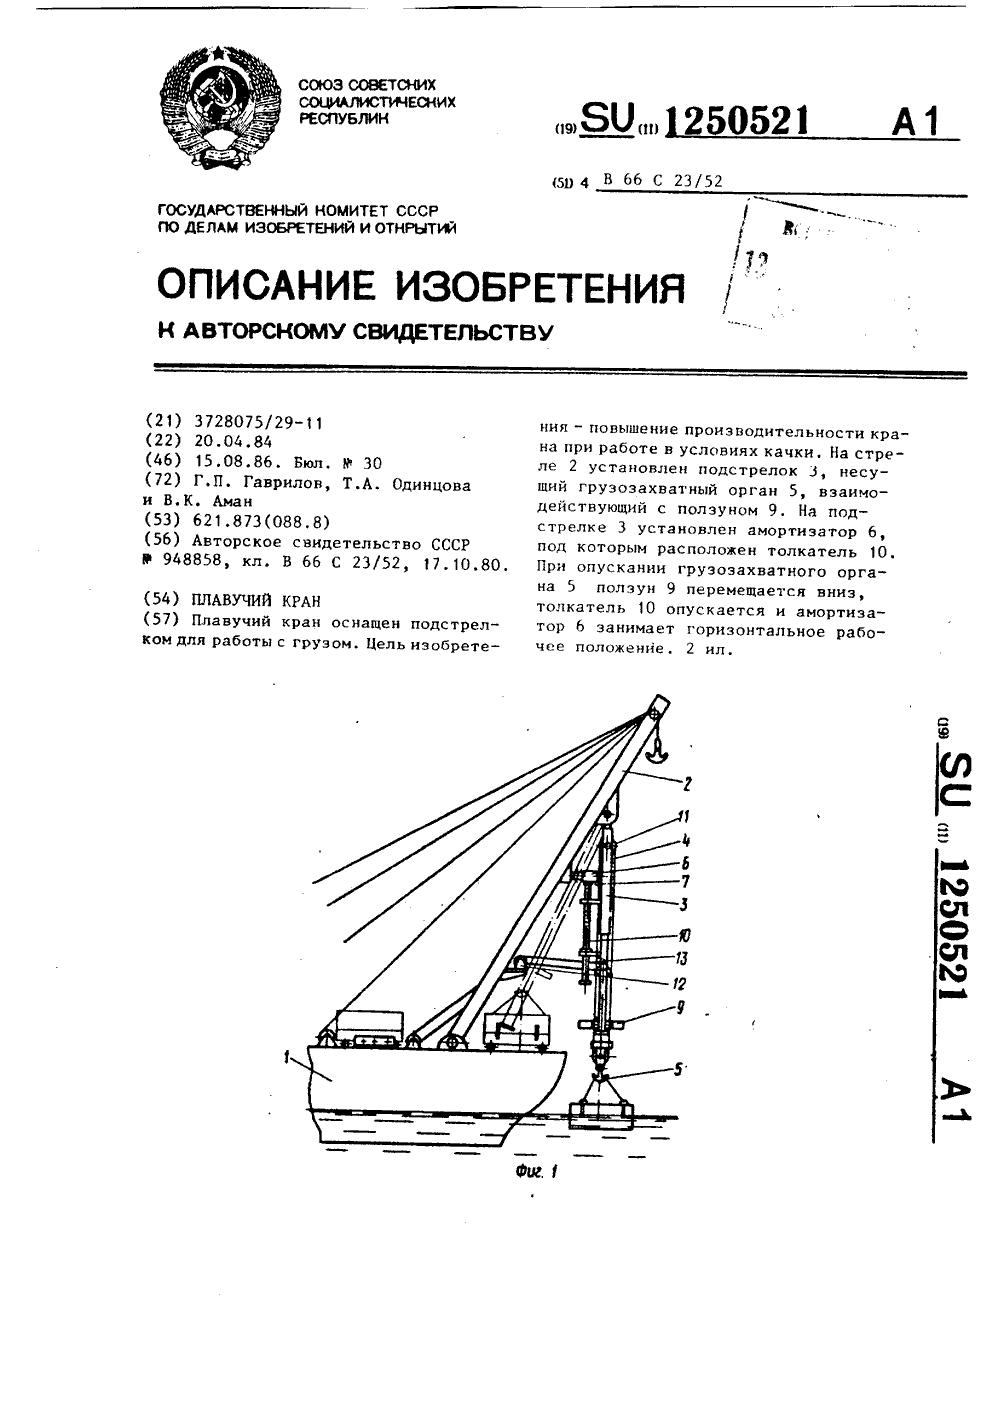 плавучие краны схема